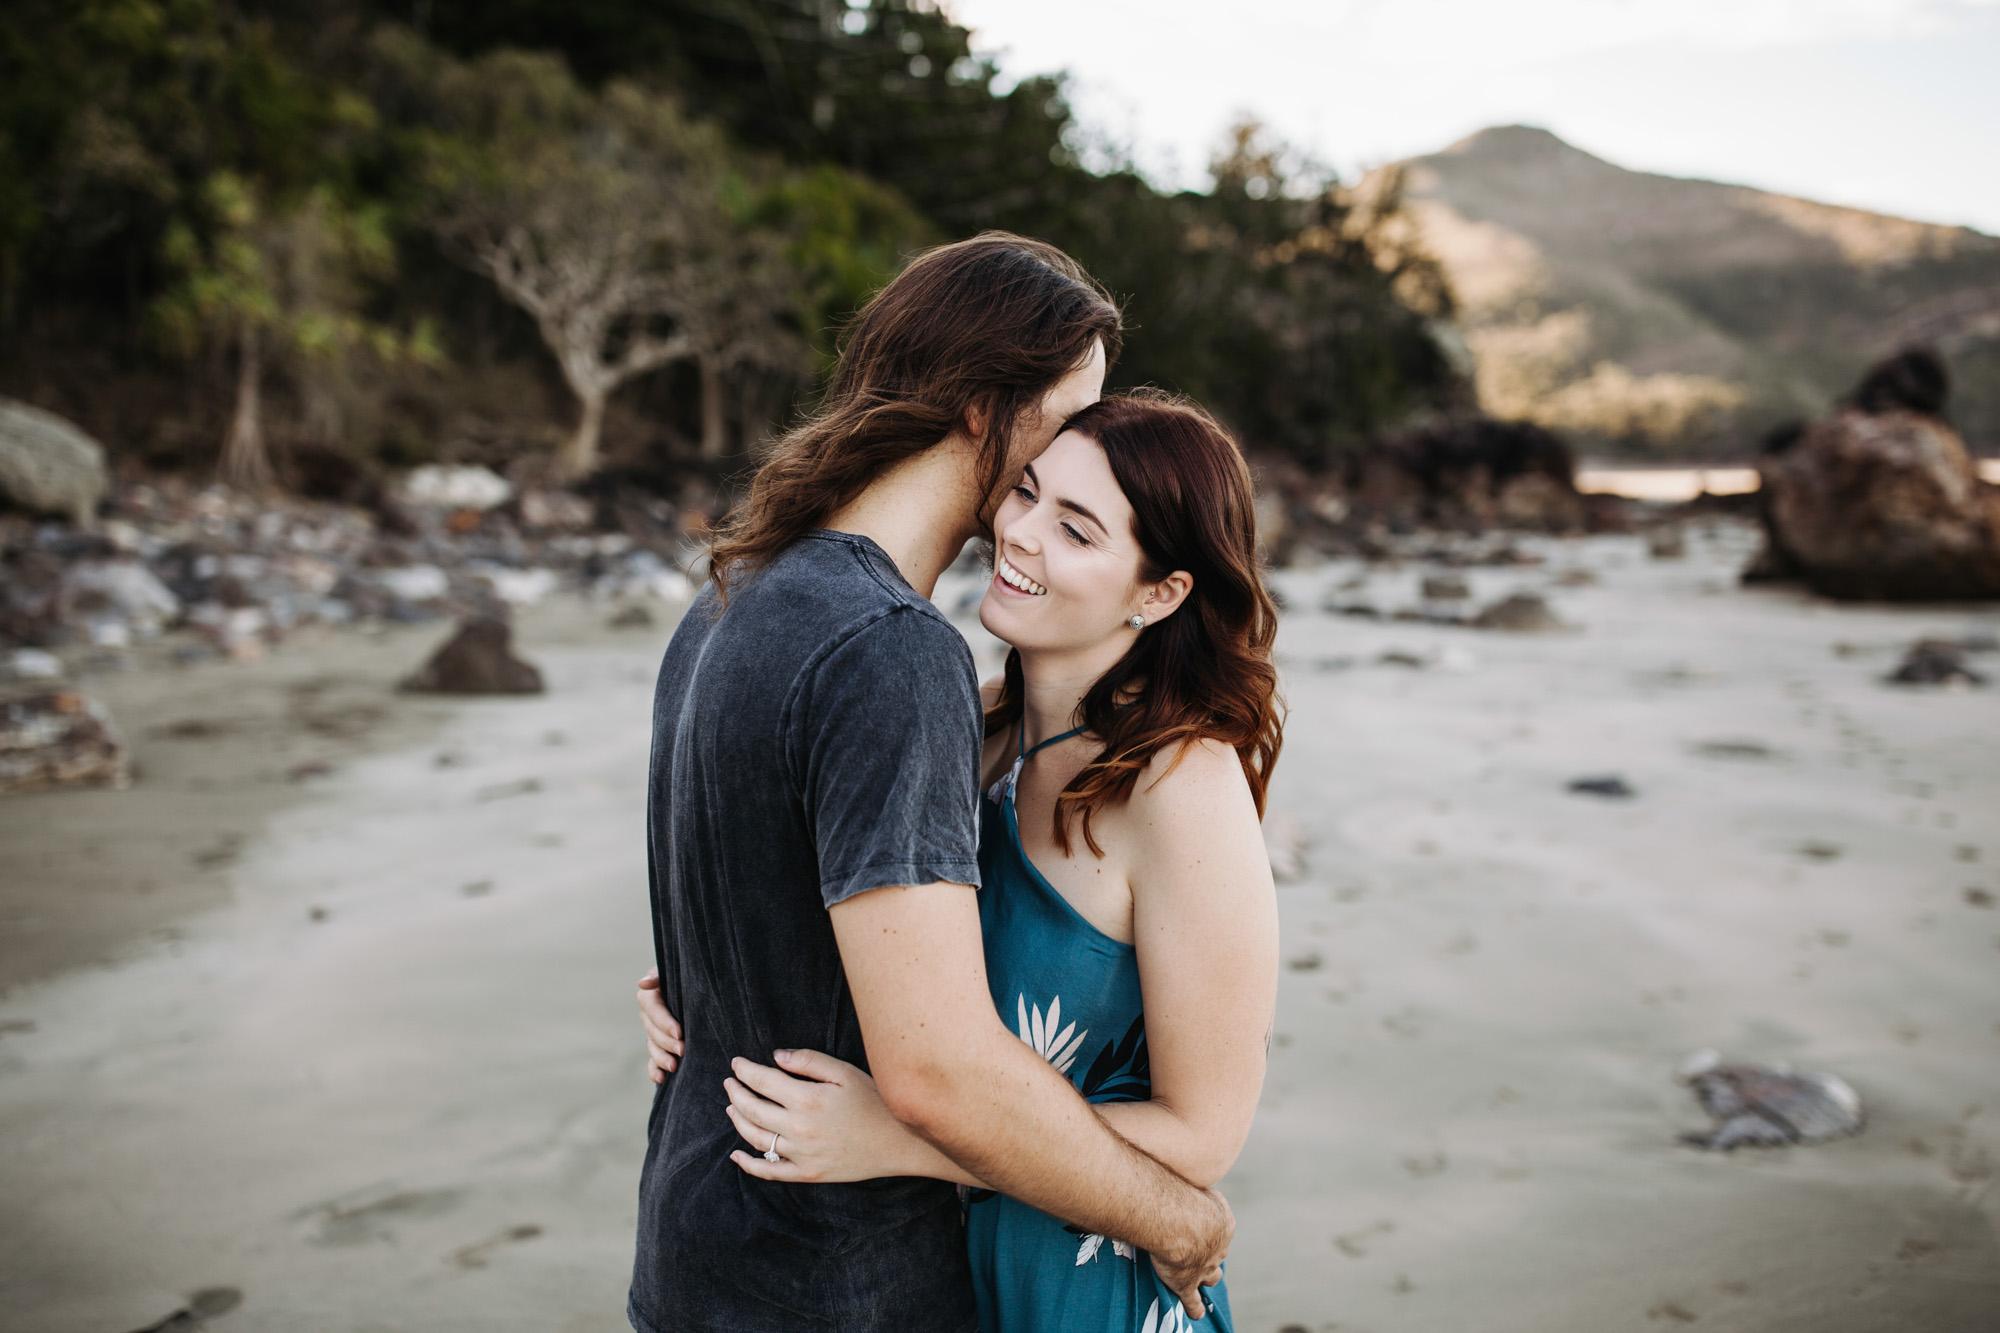 Bek & Paul Engagement-29.jpg